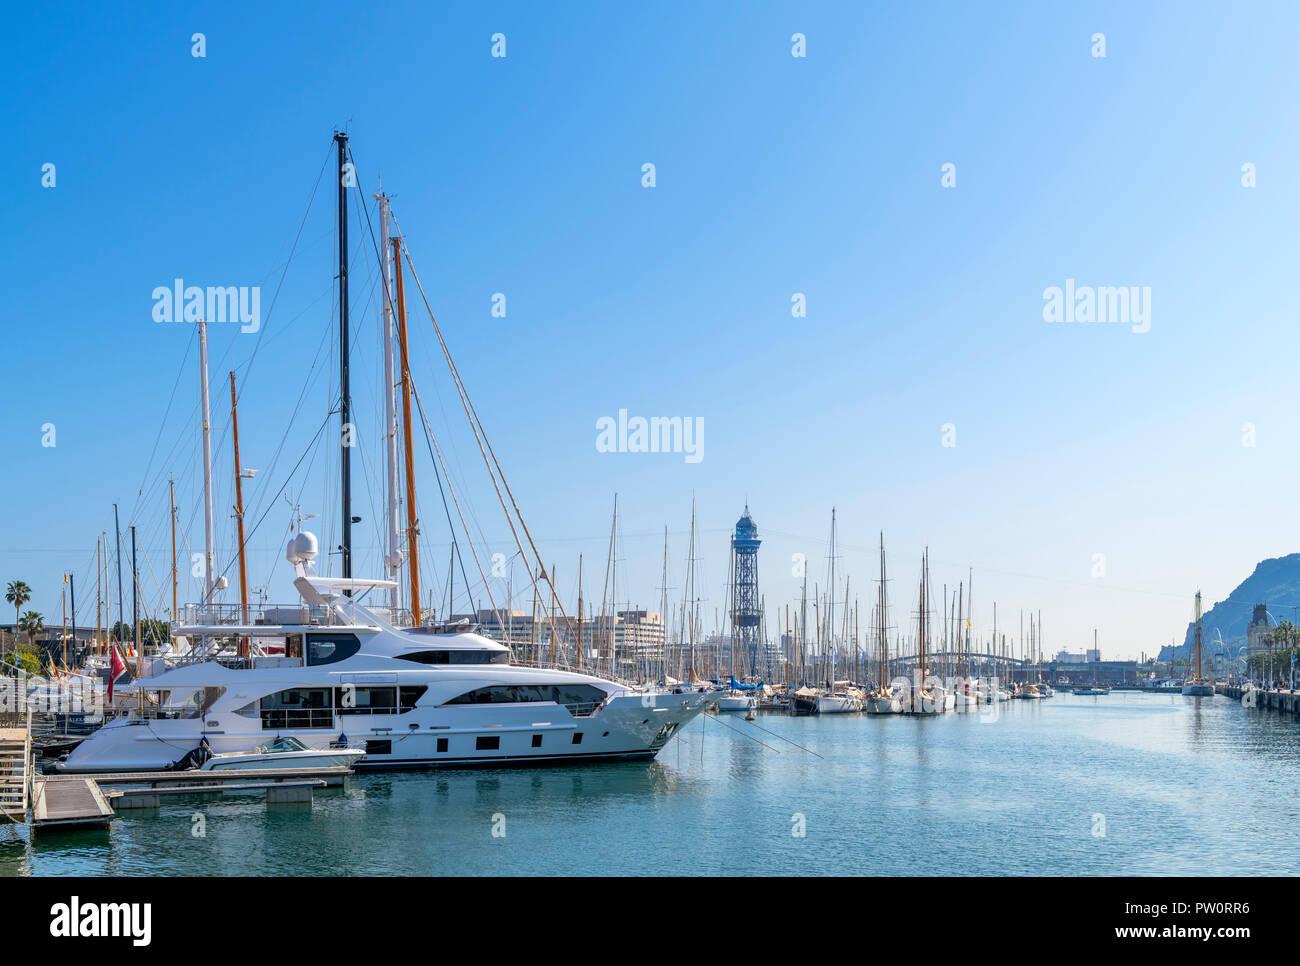 The marina in Port Vell (Old Port) in Barcelona, Spain - Stock Image